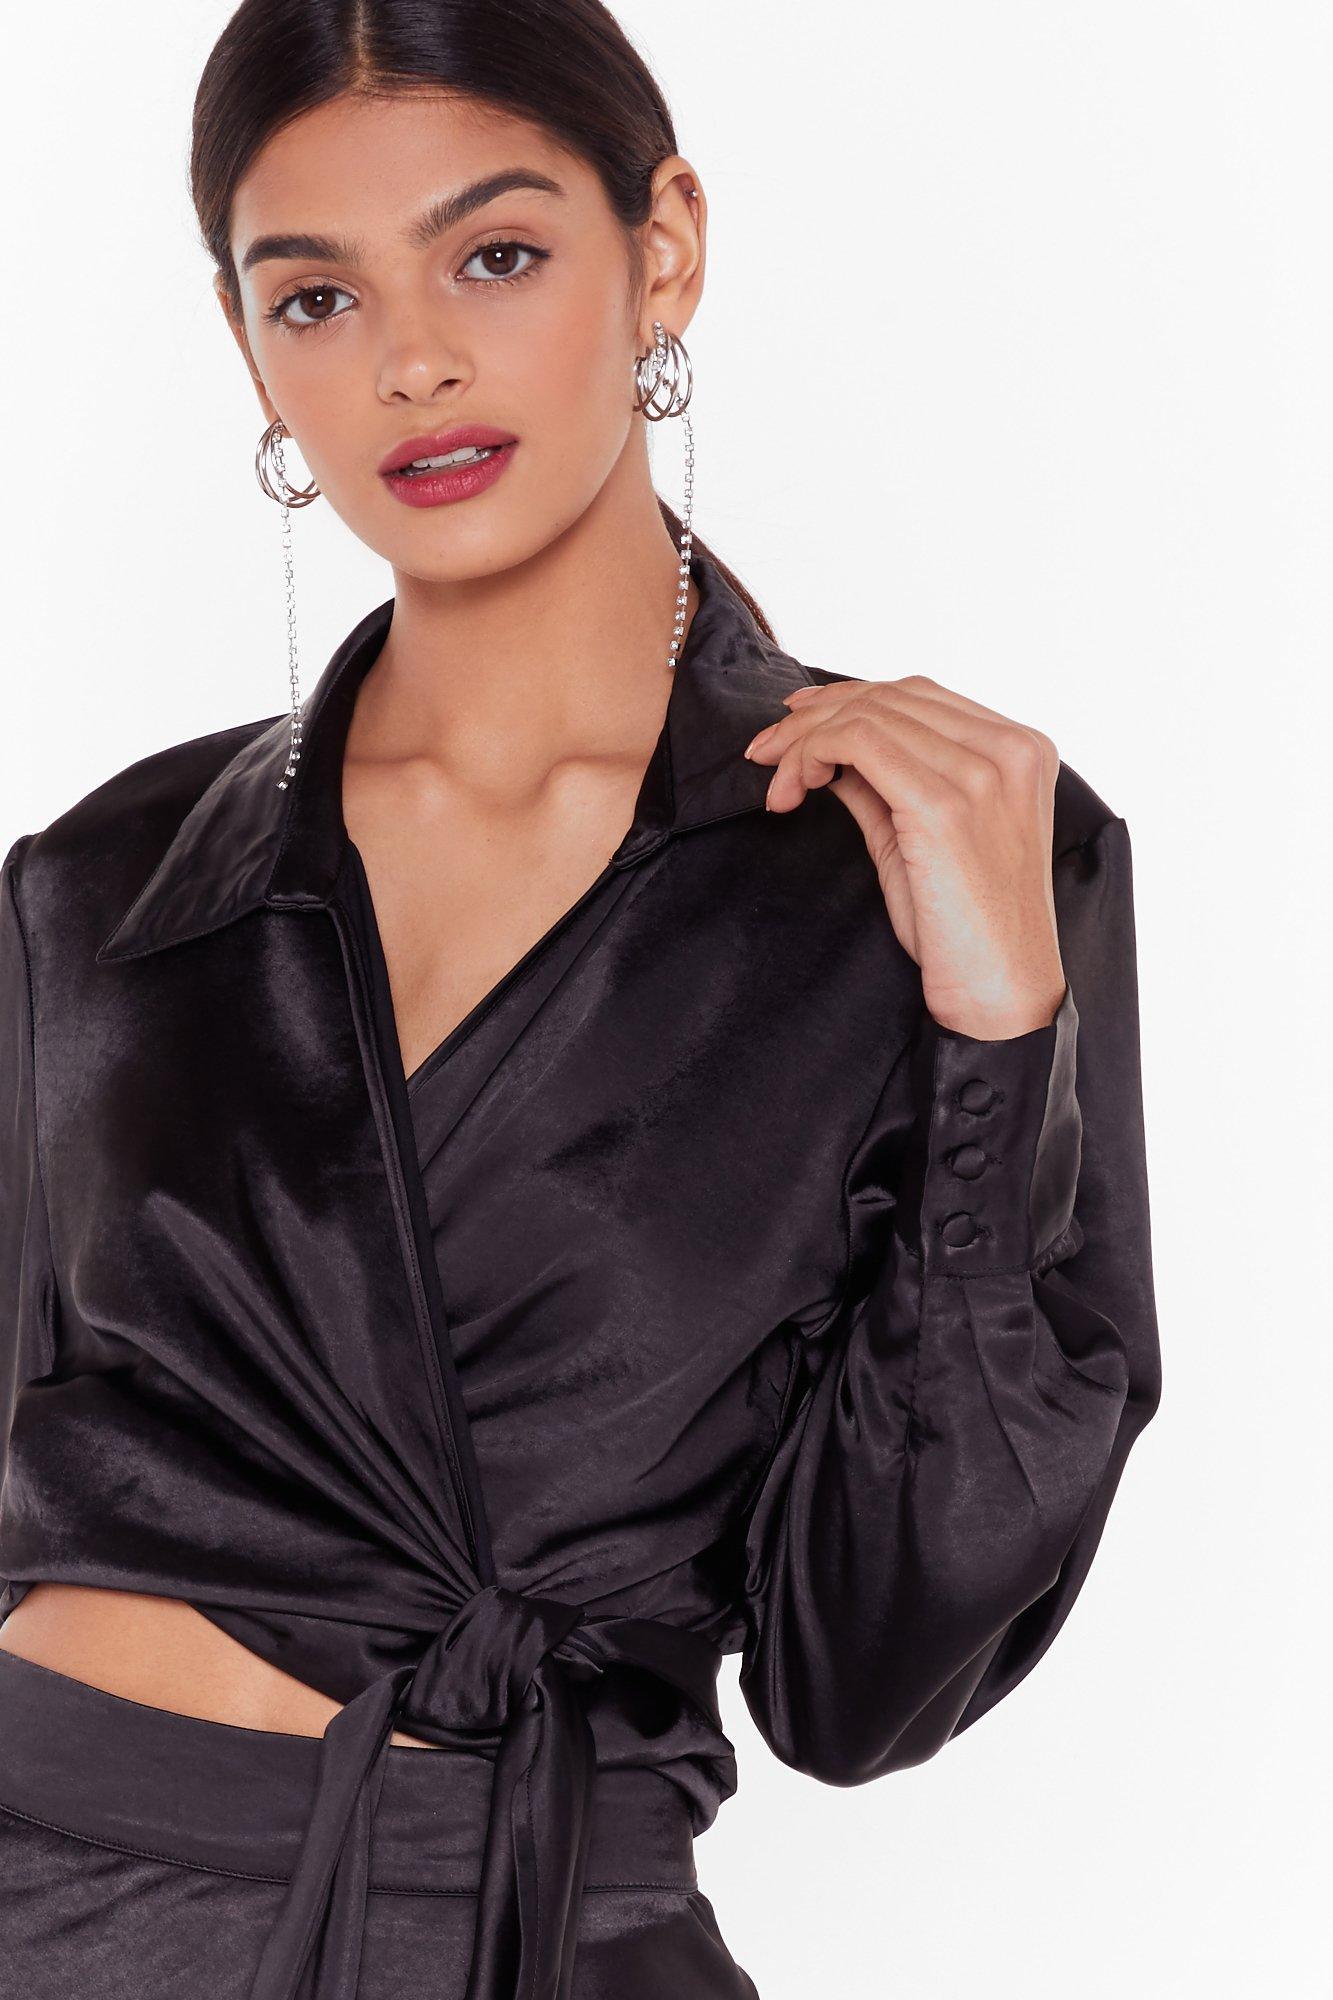 Image of Nasty Gal Studio Sleek for You Satin Shirt